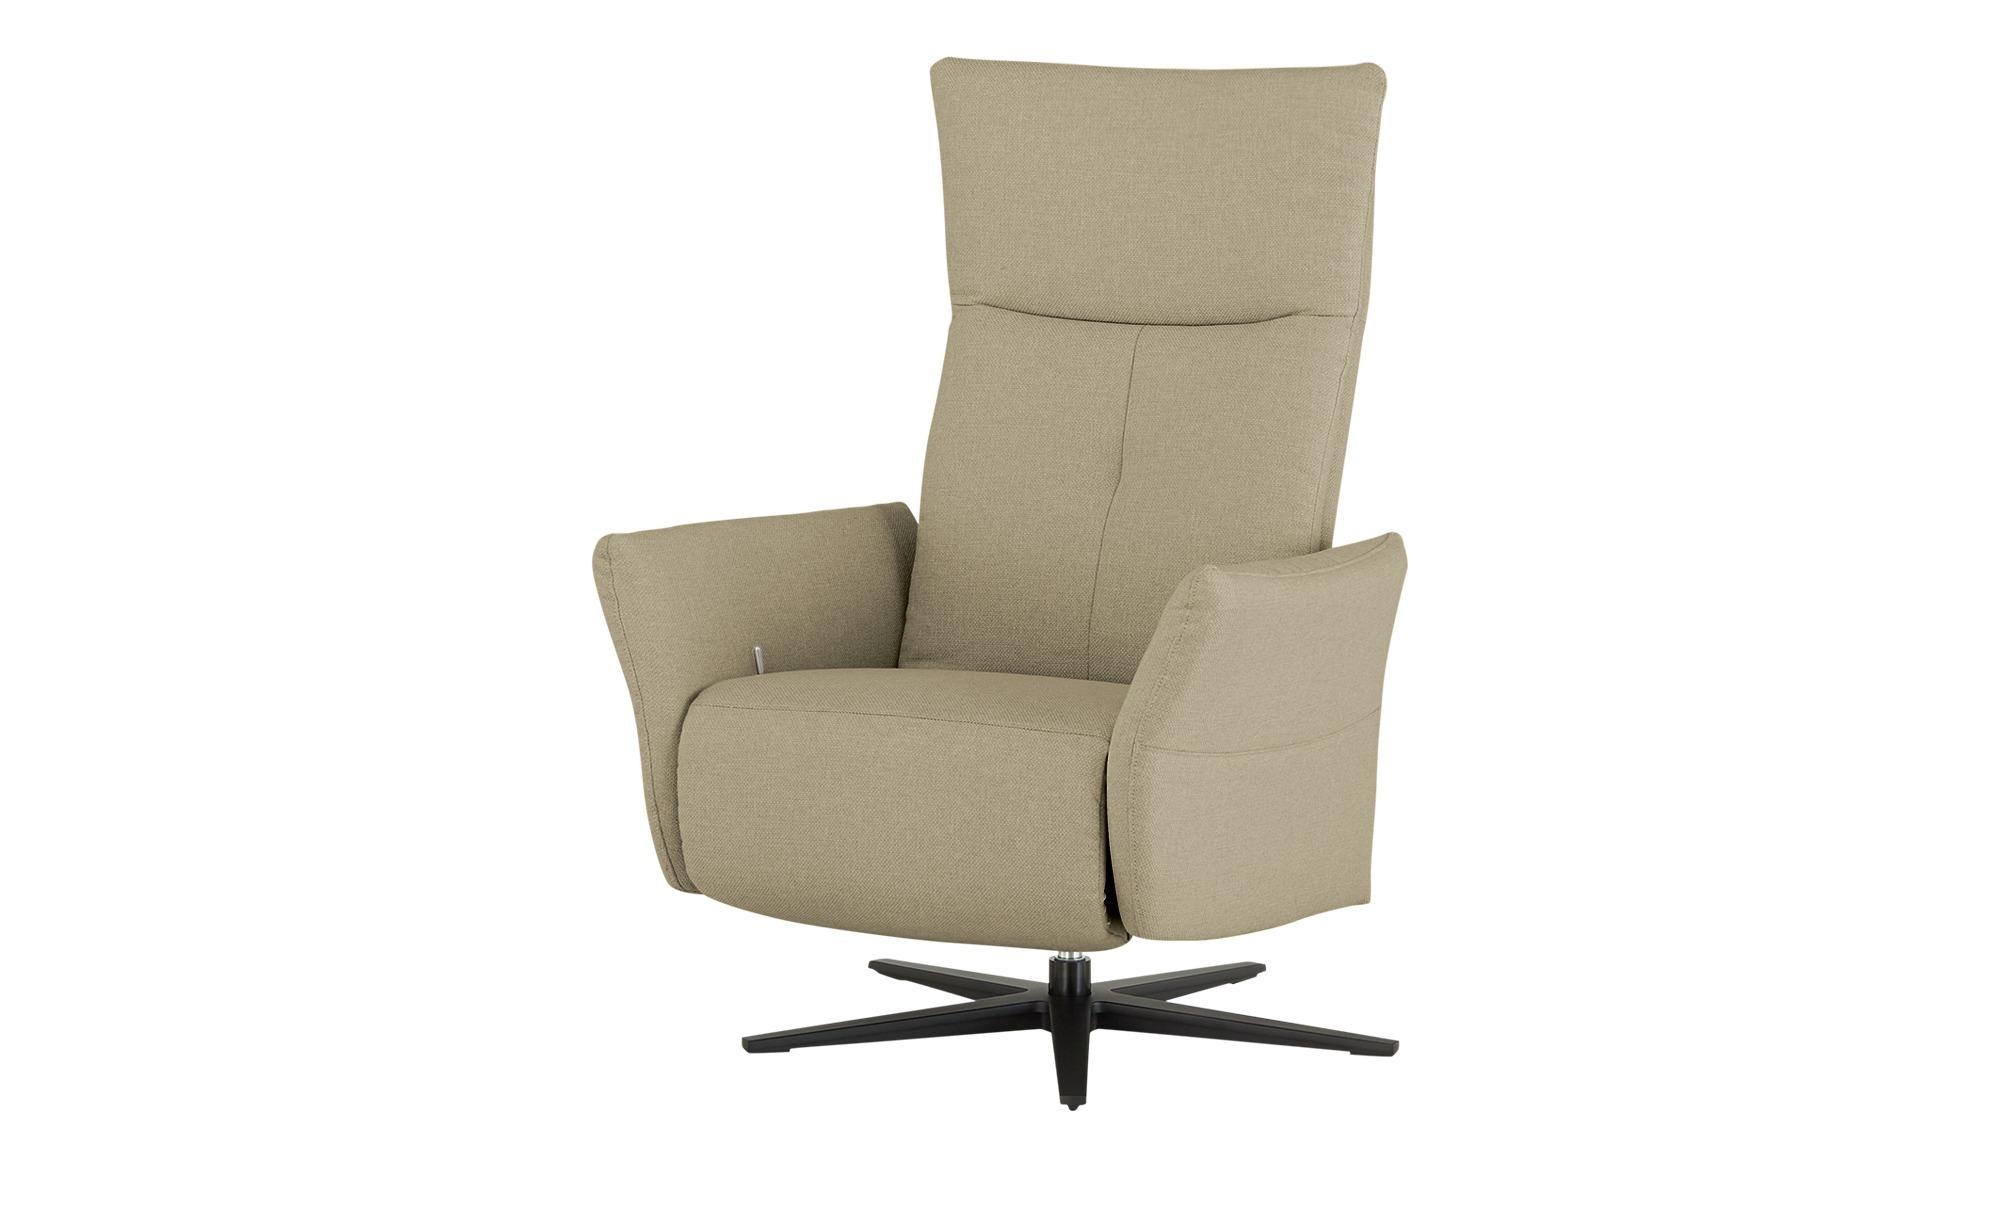 Wohnwert Funktionssessel  Katja ¦ beige ¦ Maße (cm): B: 79 H: 110 T: 80 Polstermöbel > Sessel > Drehsessel - Höffner